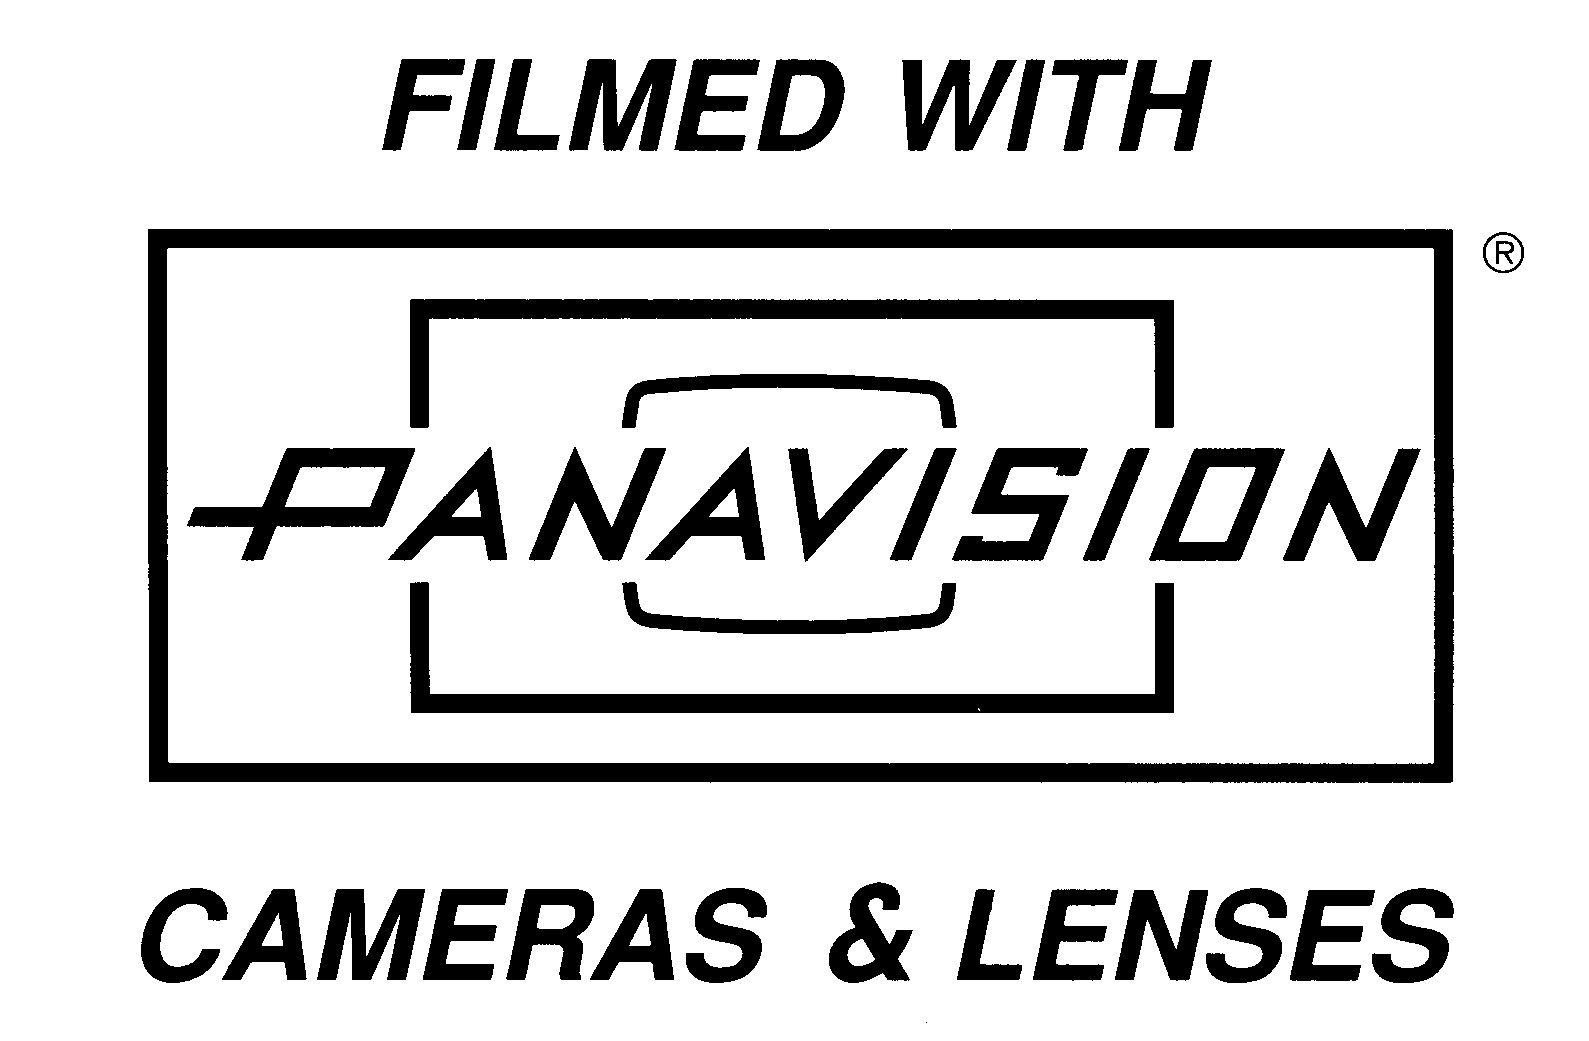 panavision logo google search panavision so moove